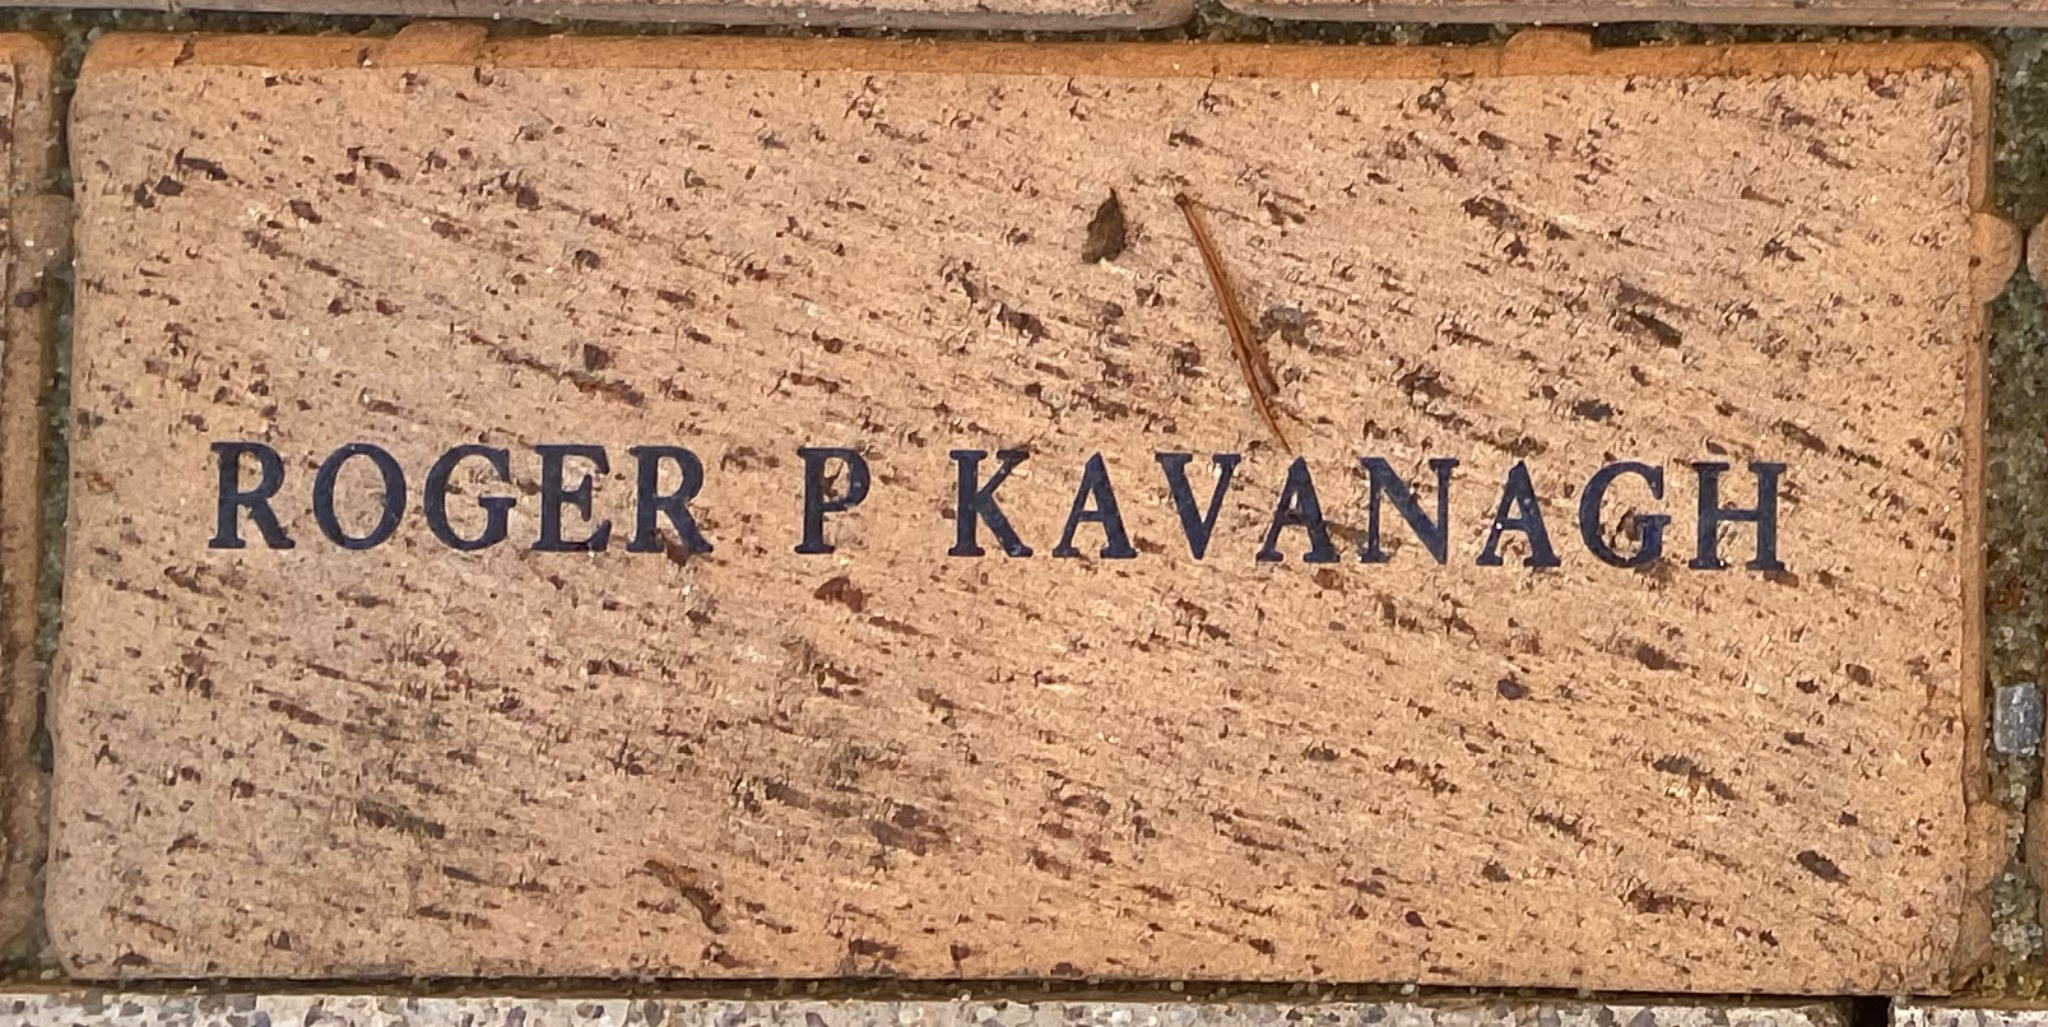 ROGER P KAVANAGH